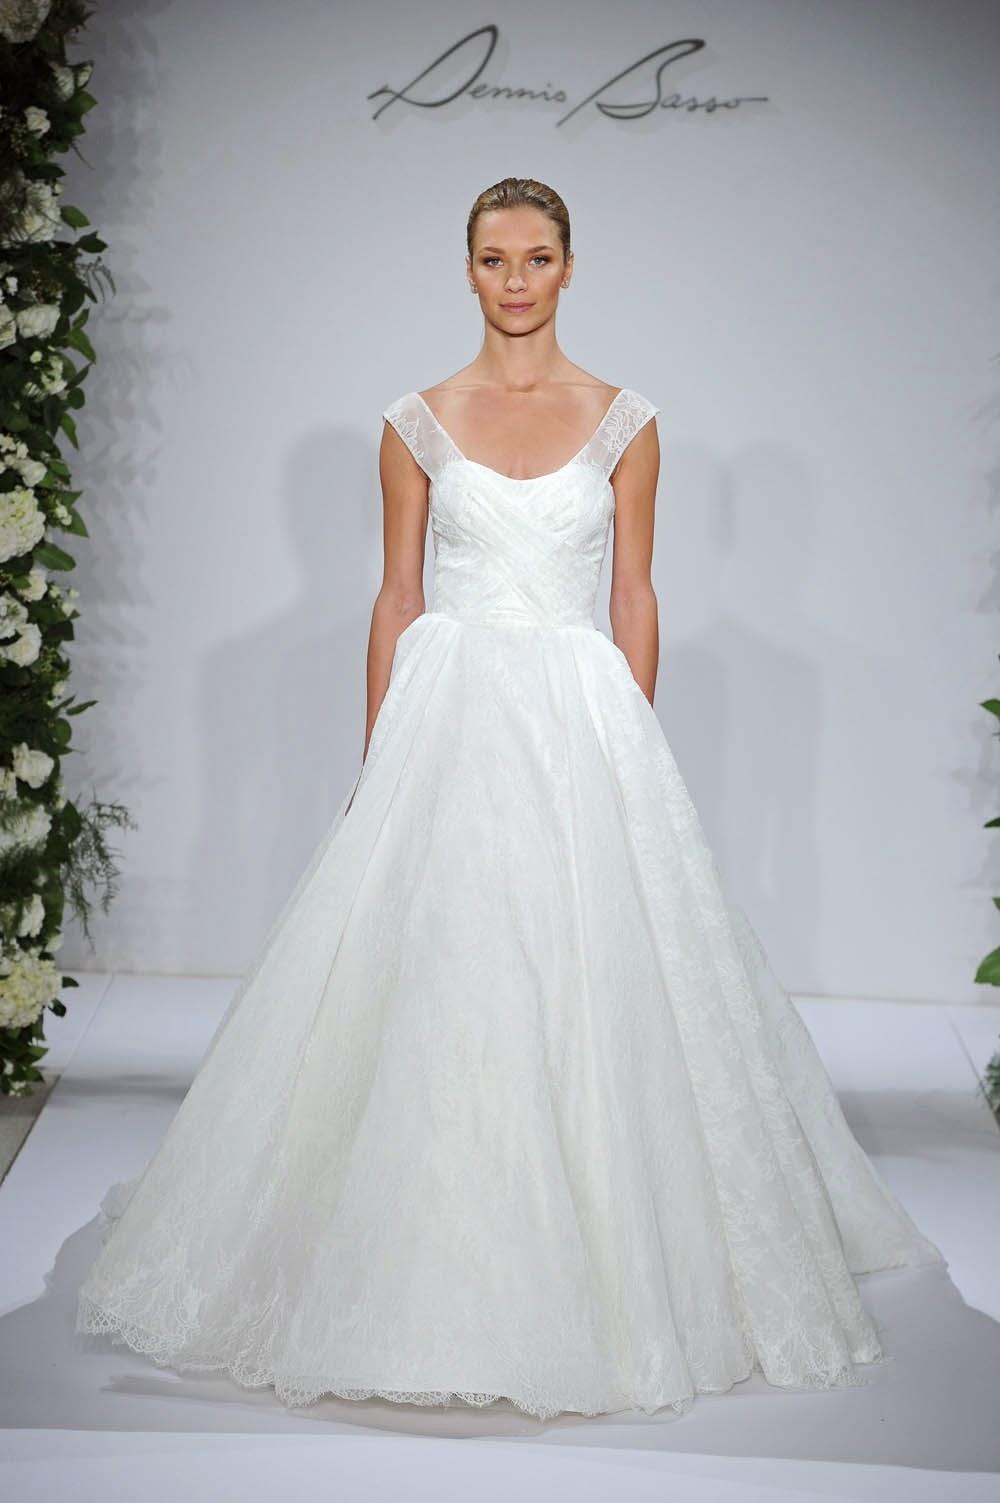 Dennis Basso Fall 2015 Wedding Dresses - Runway - World of ...